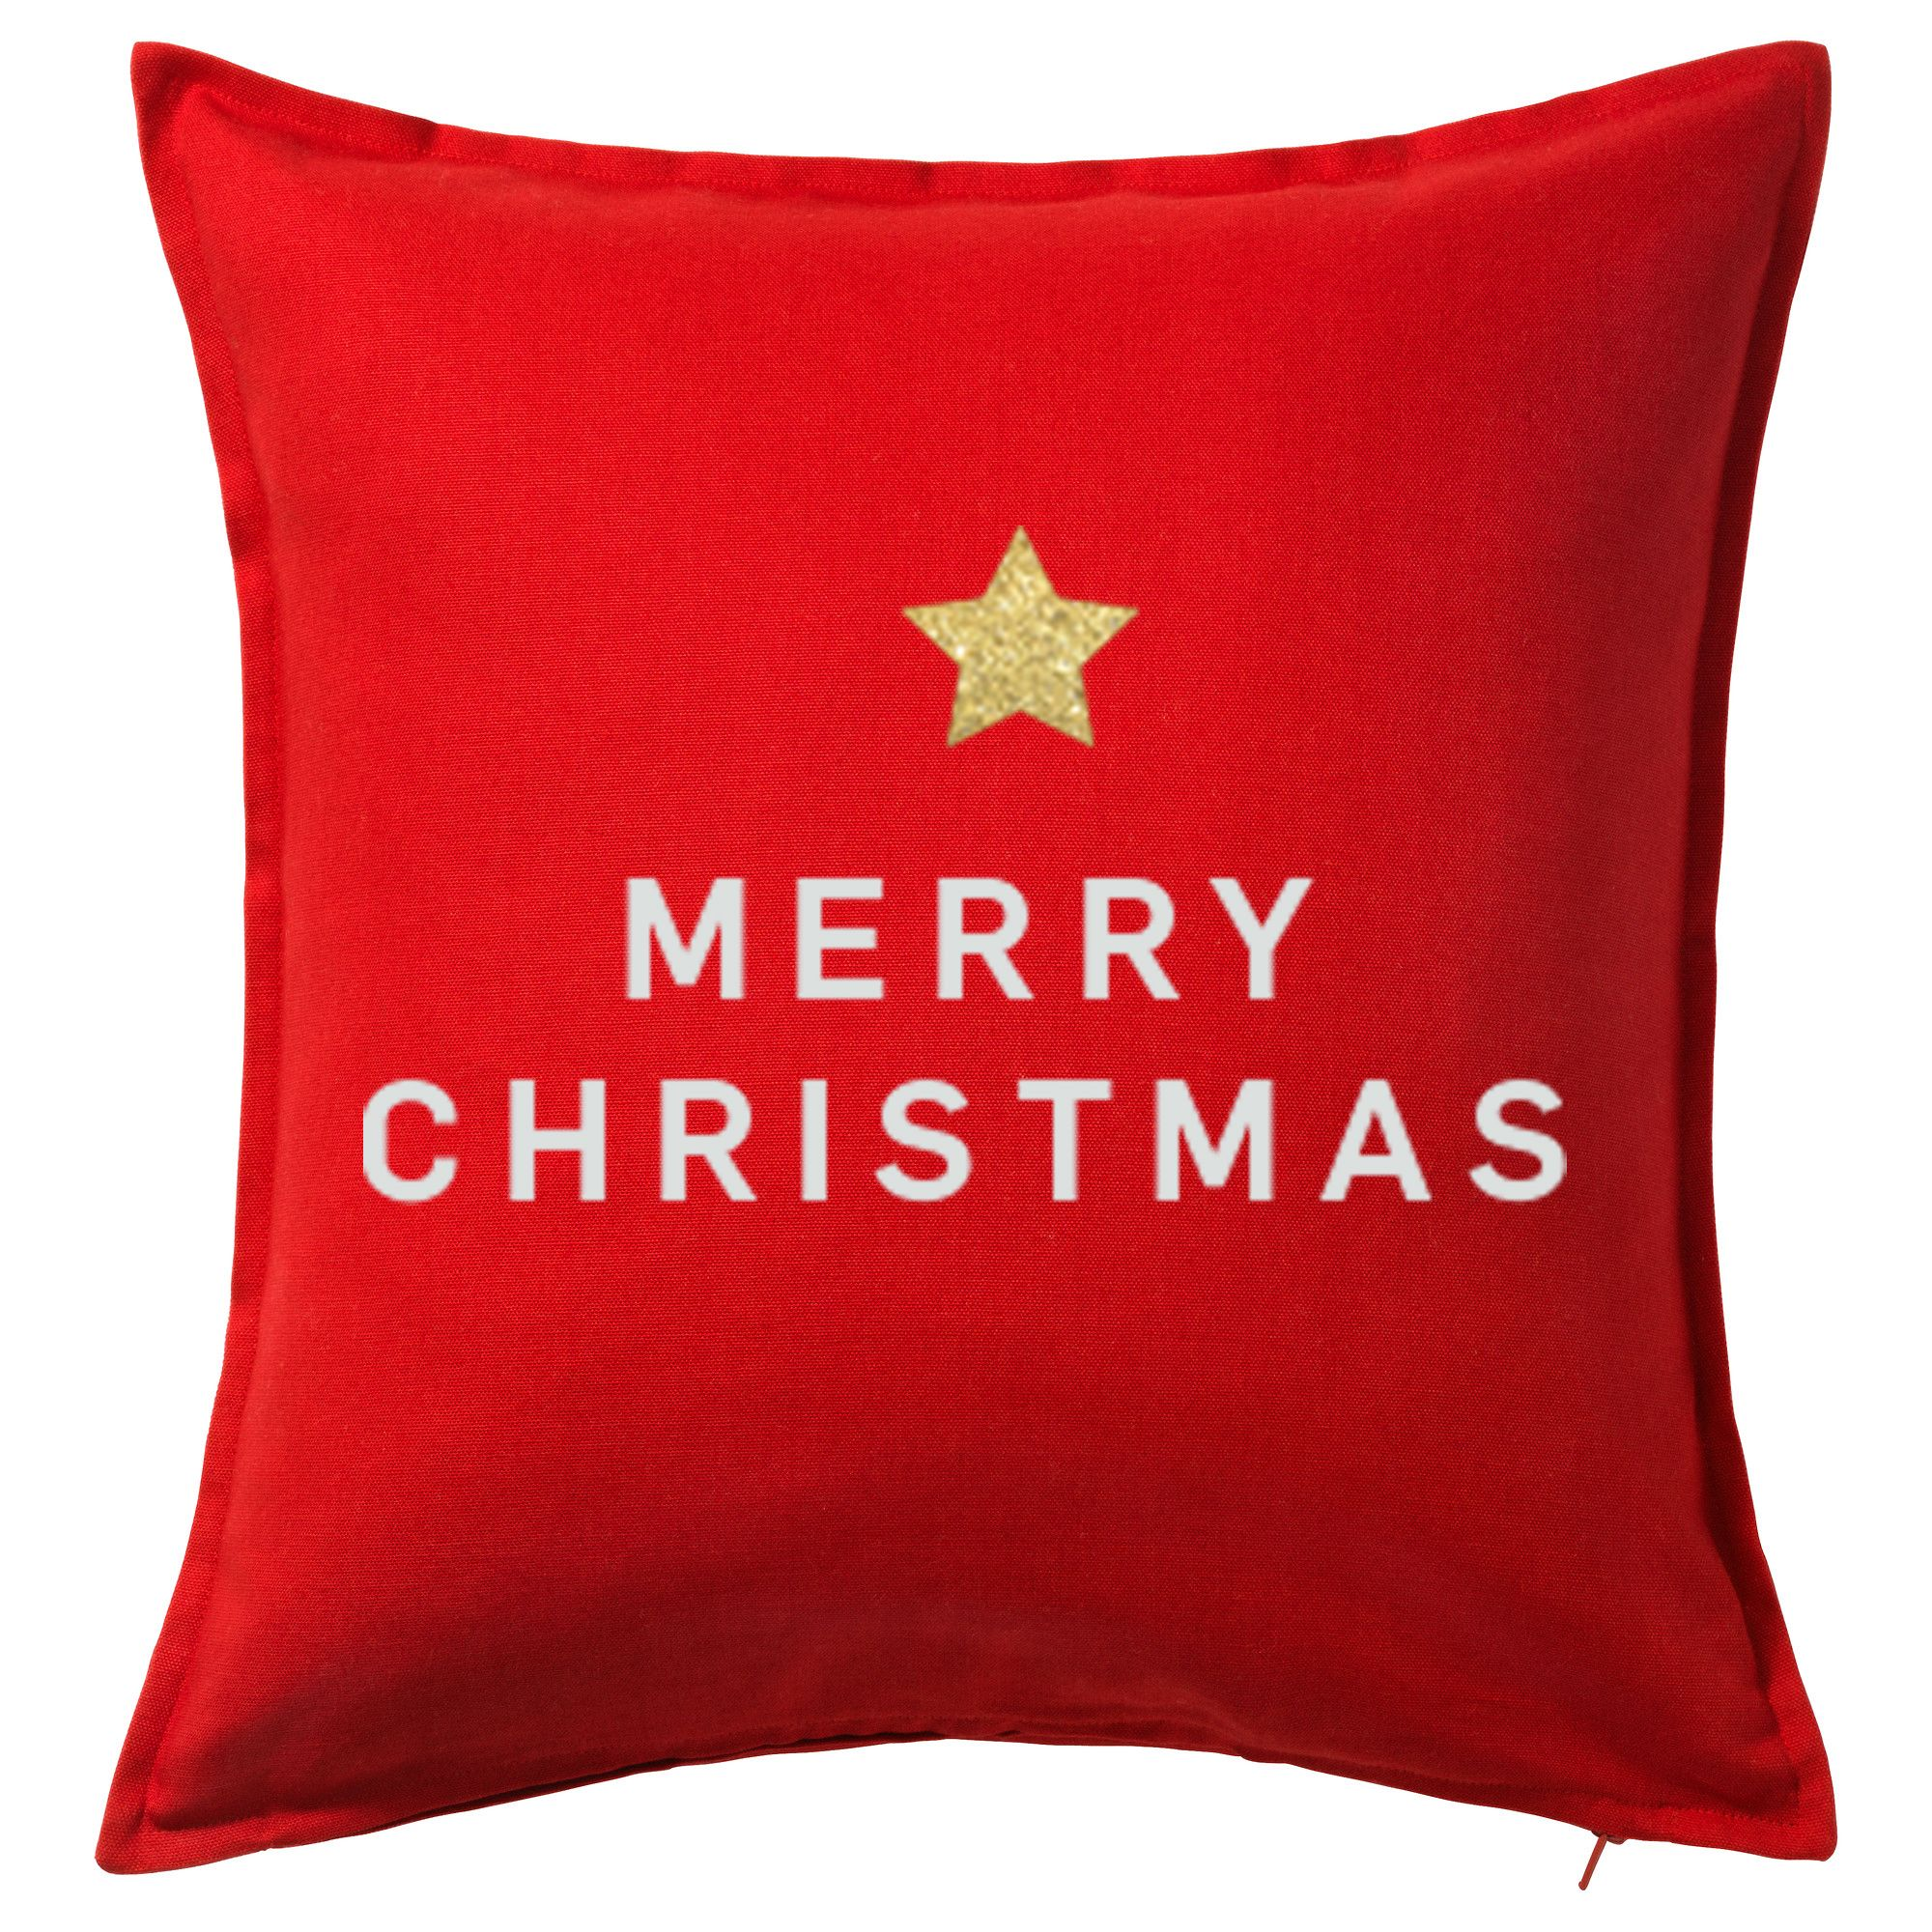 Merry christmasu red pillow interior christmas decoration